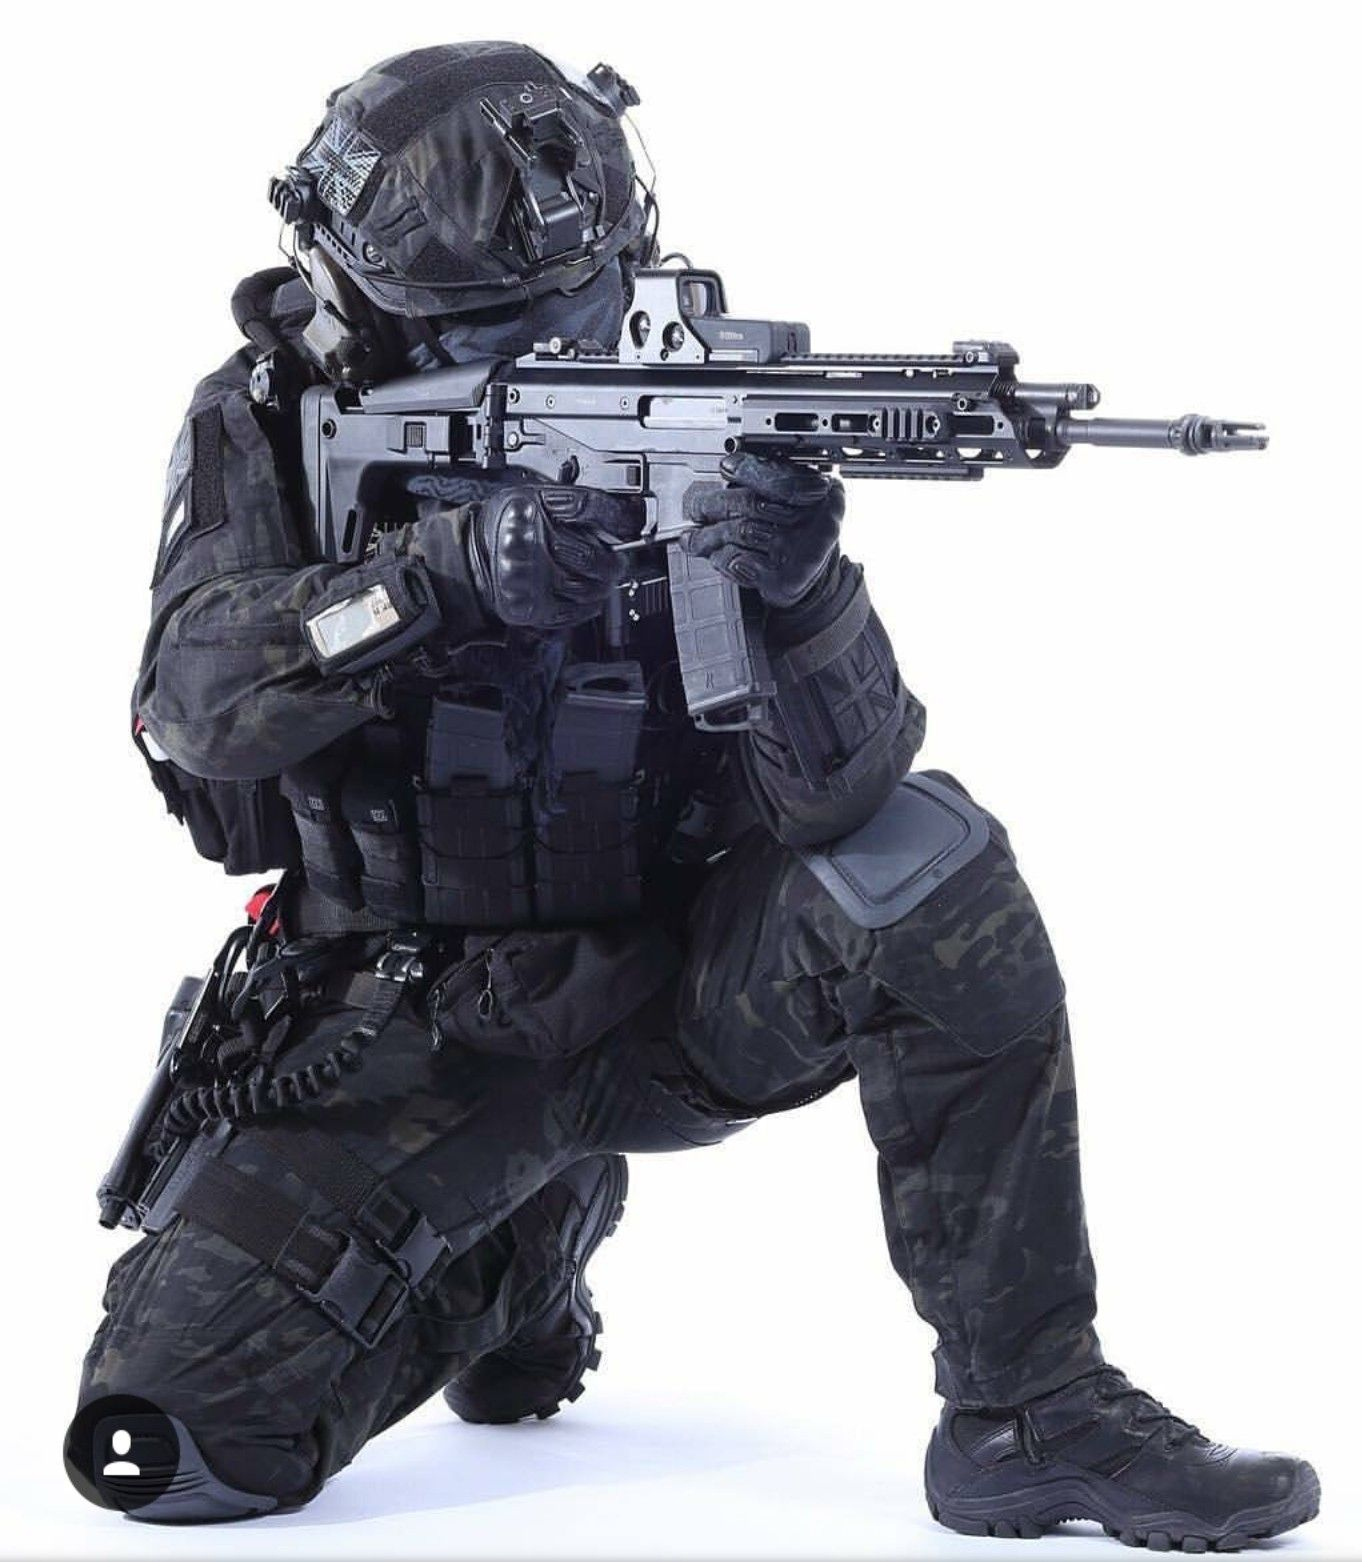 British blackwalker military special forces combat gear